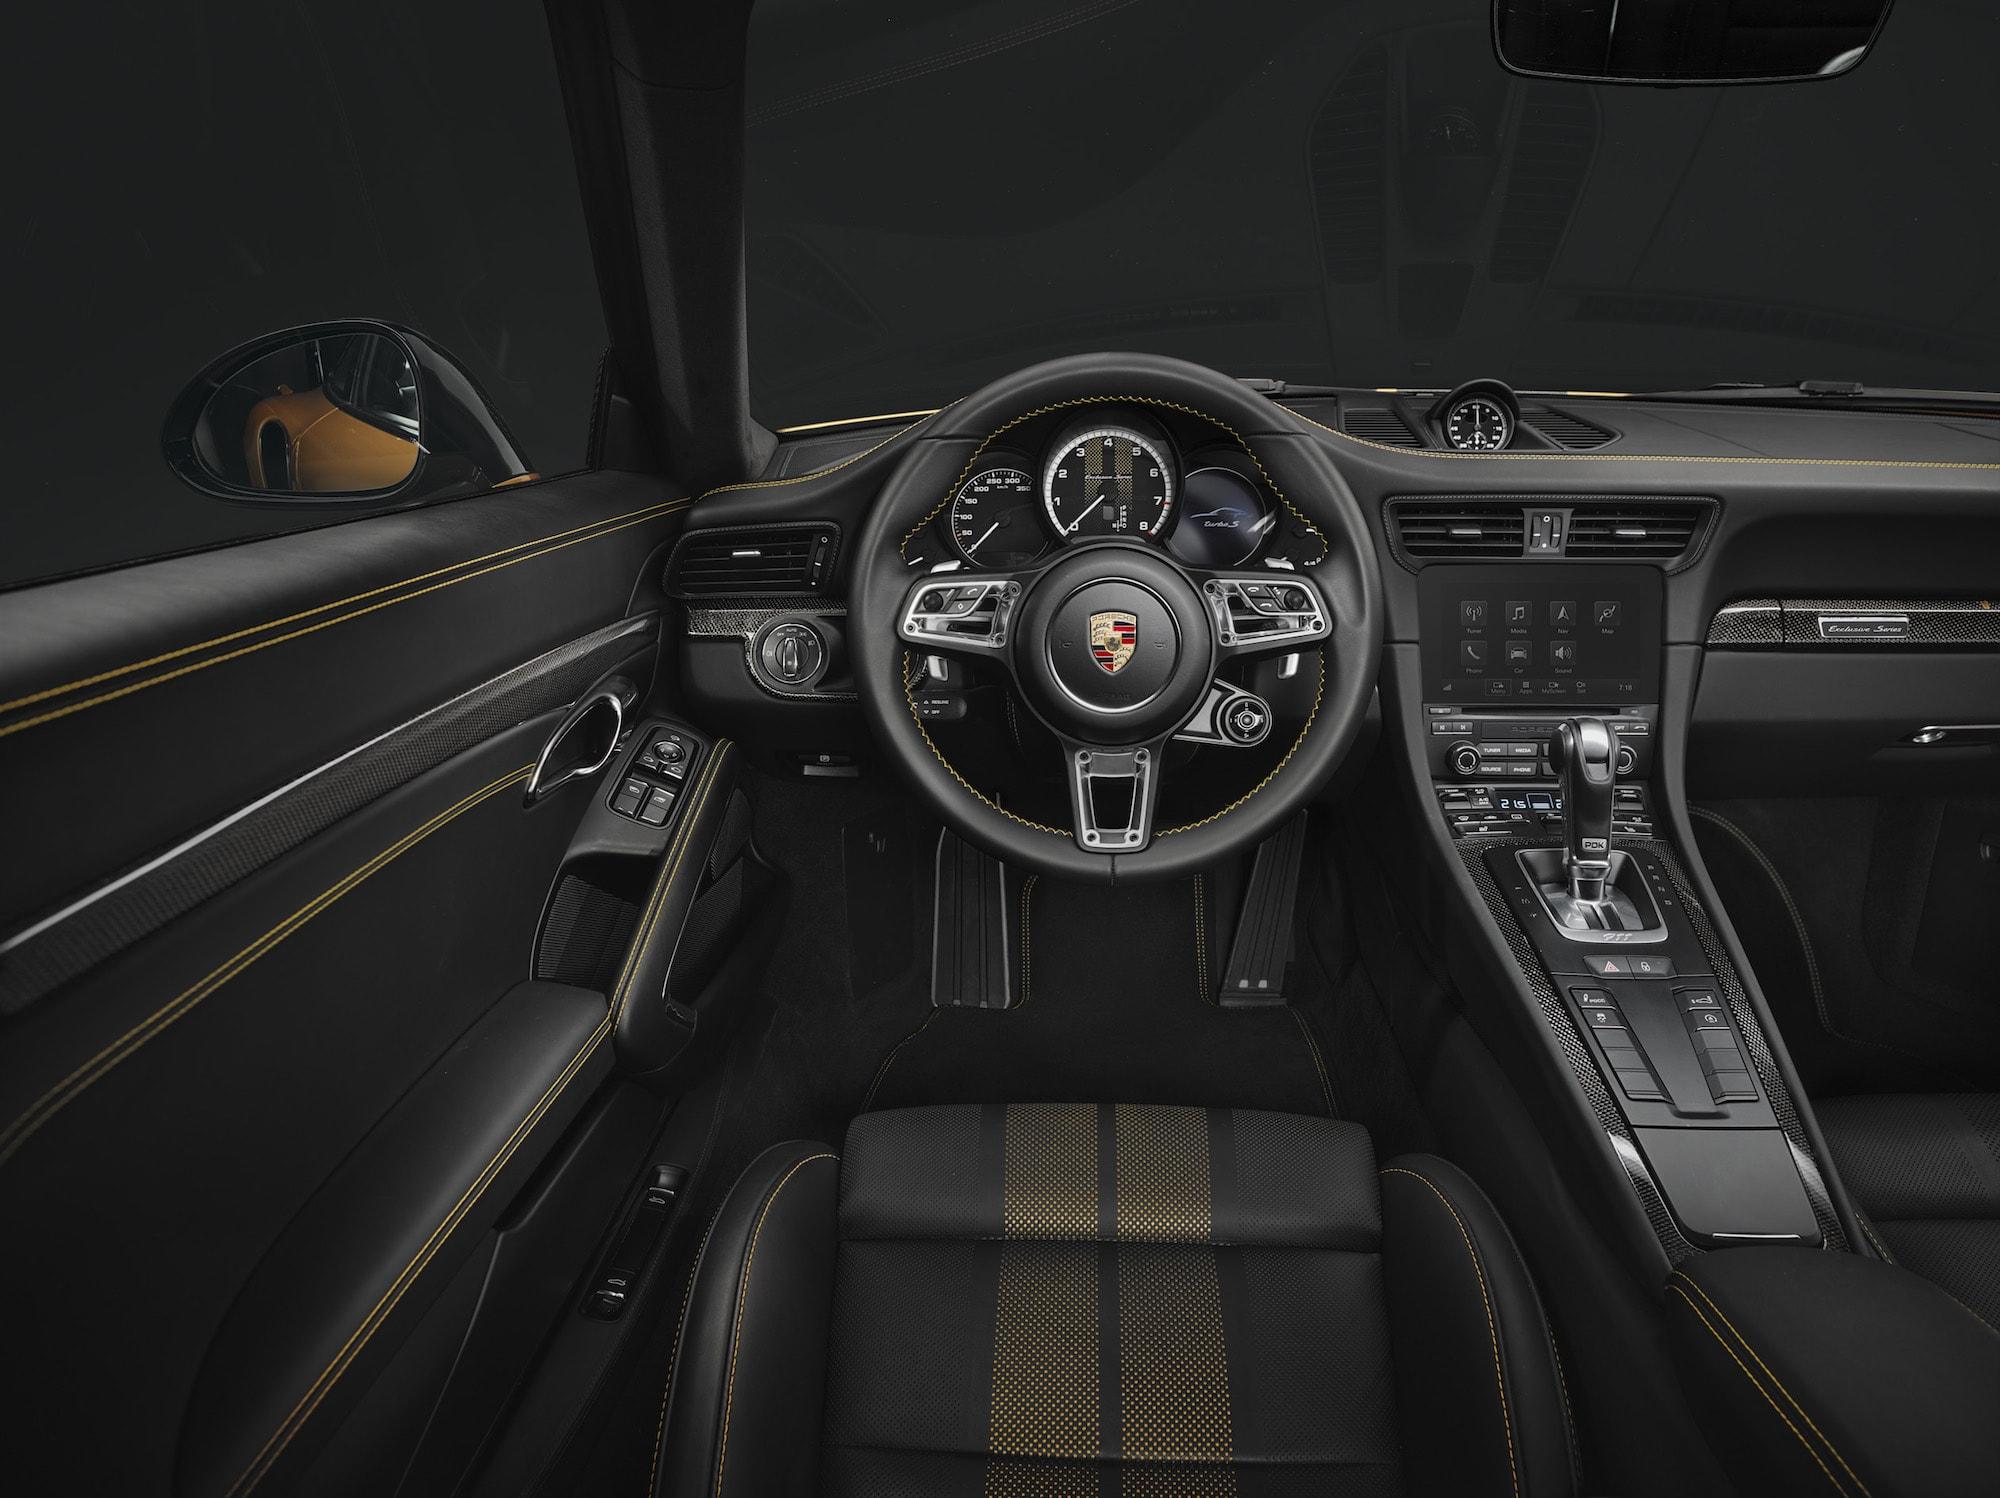 Echt goldig: Der Neue 911 Turbo S Exclusive Series 6